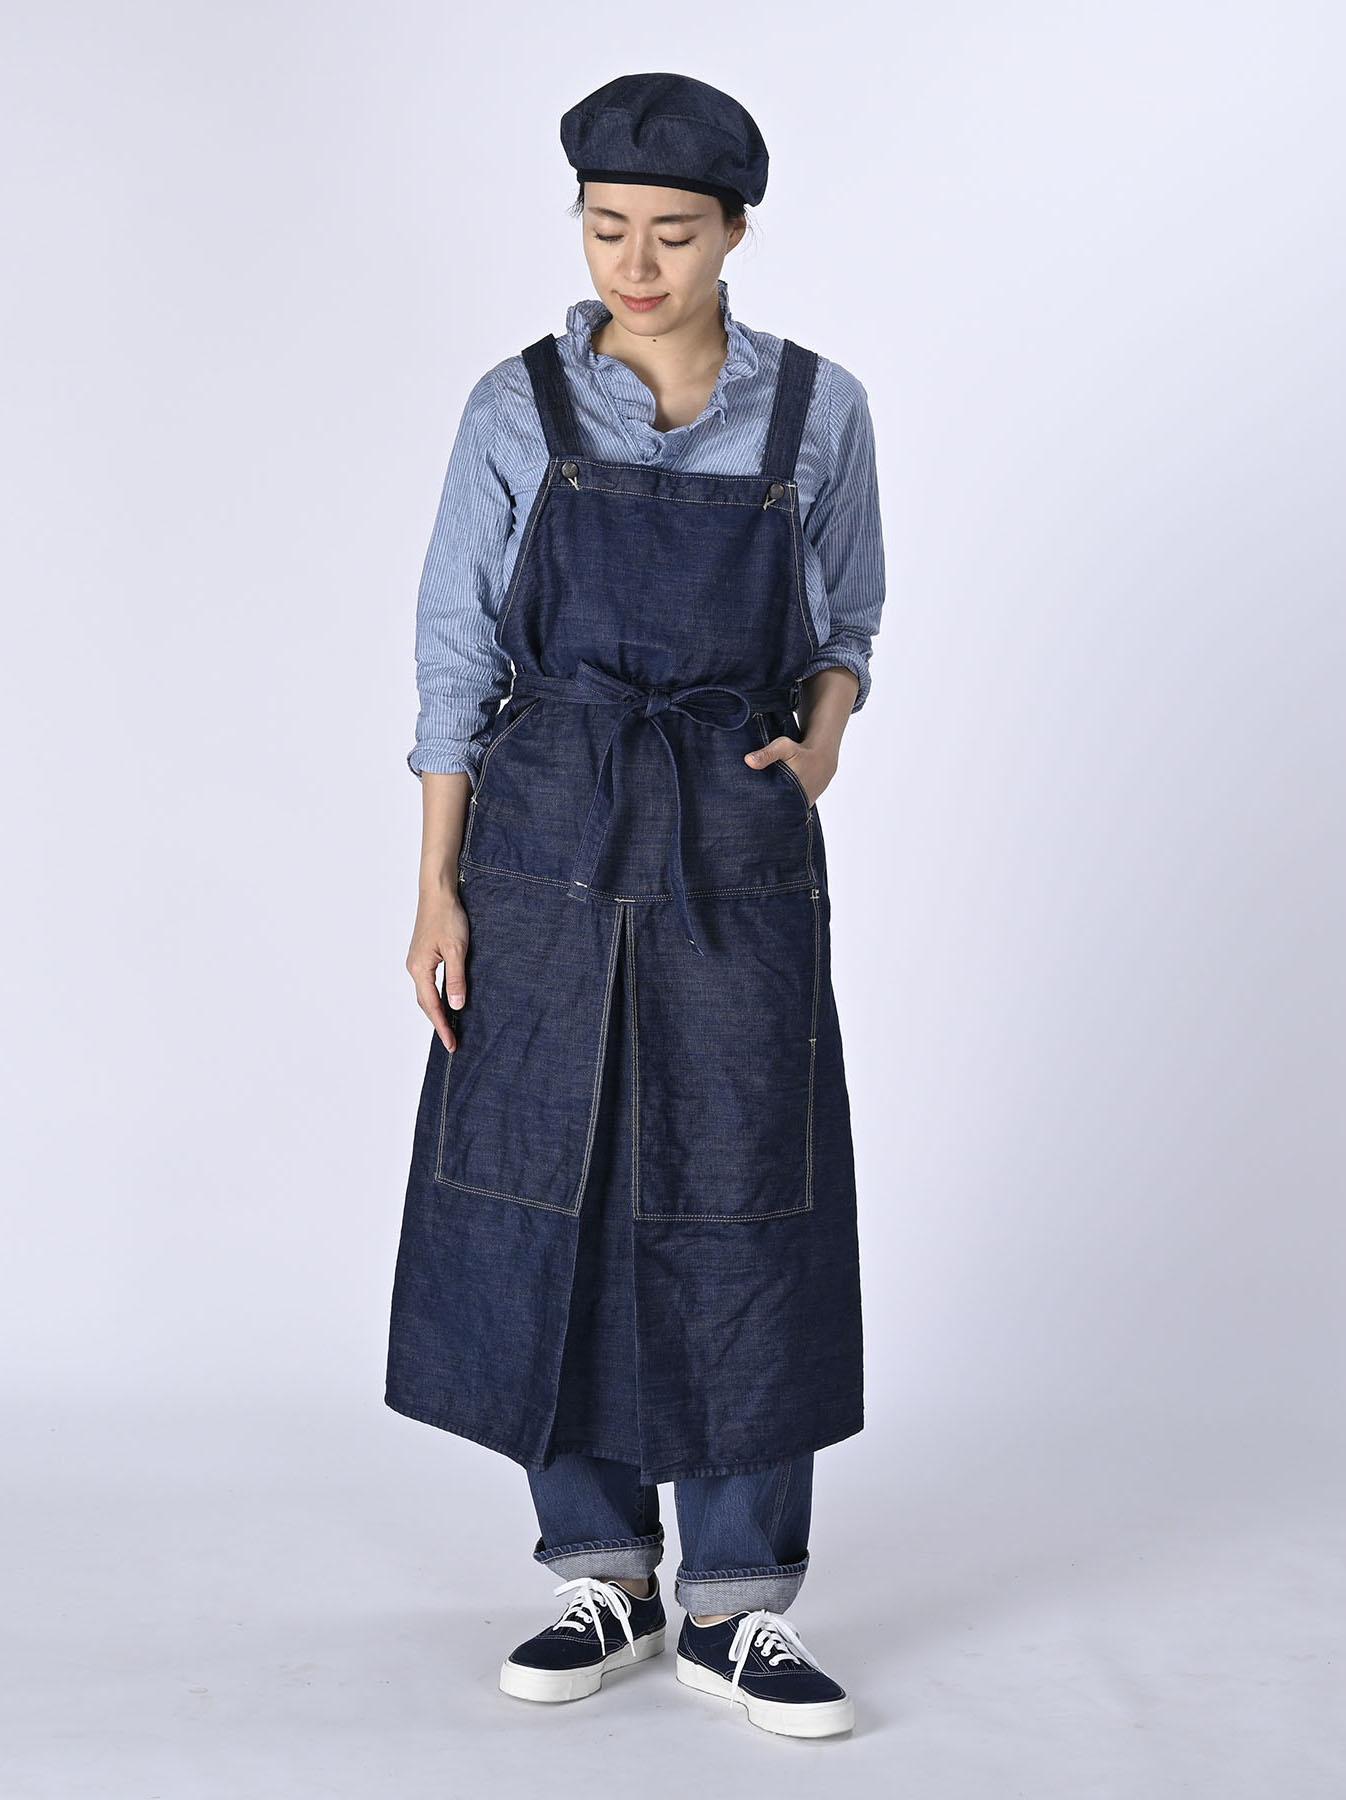 Monpu Apron Dress (0421)-2